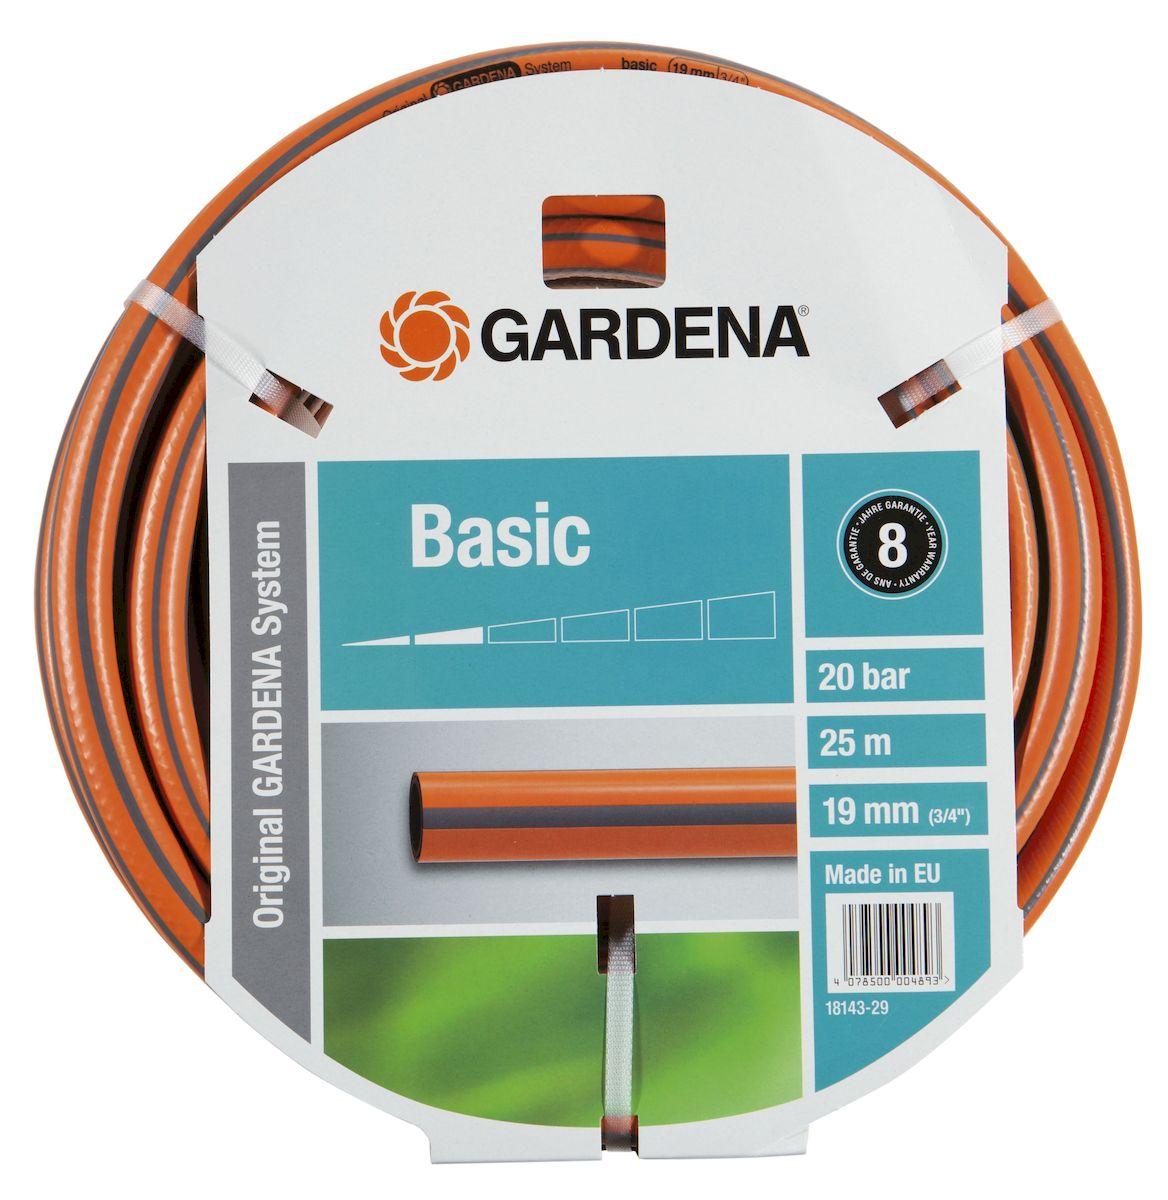 Шланг Gardena Basic, 19 мм - 3/4, 25